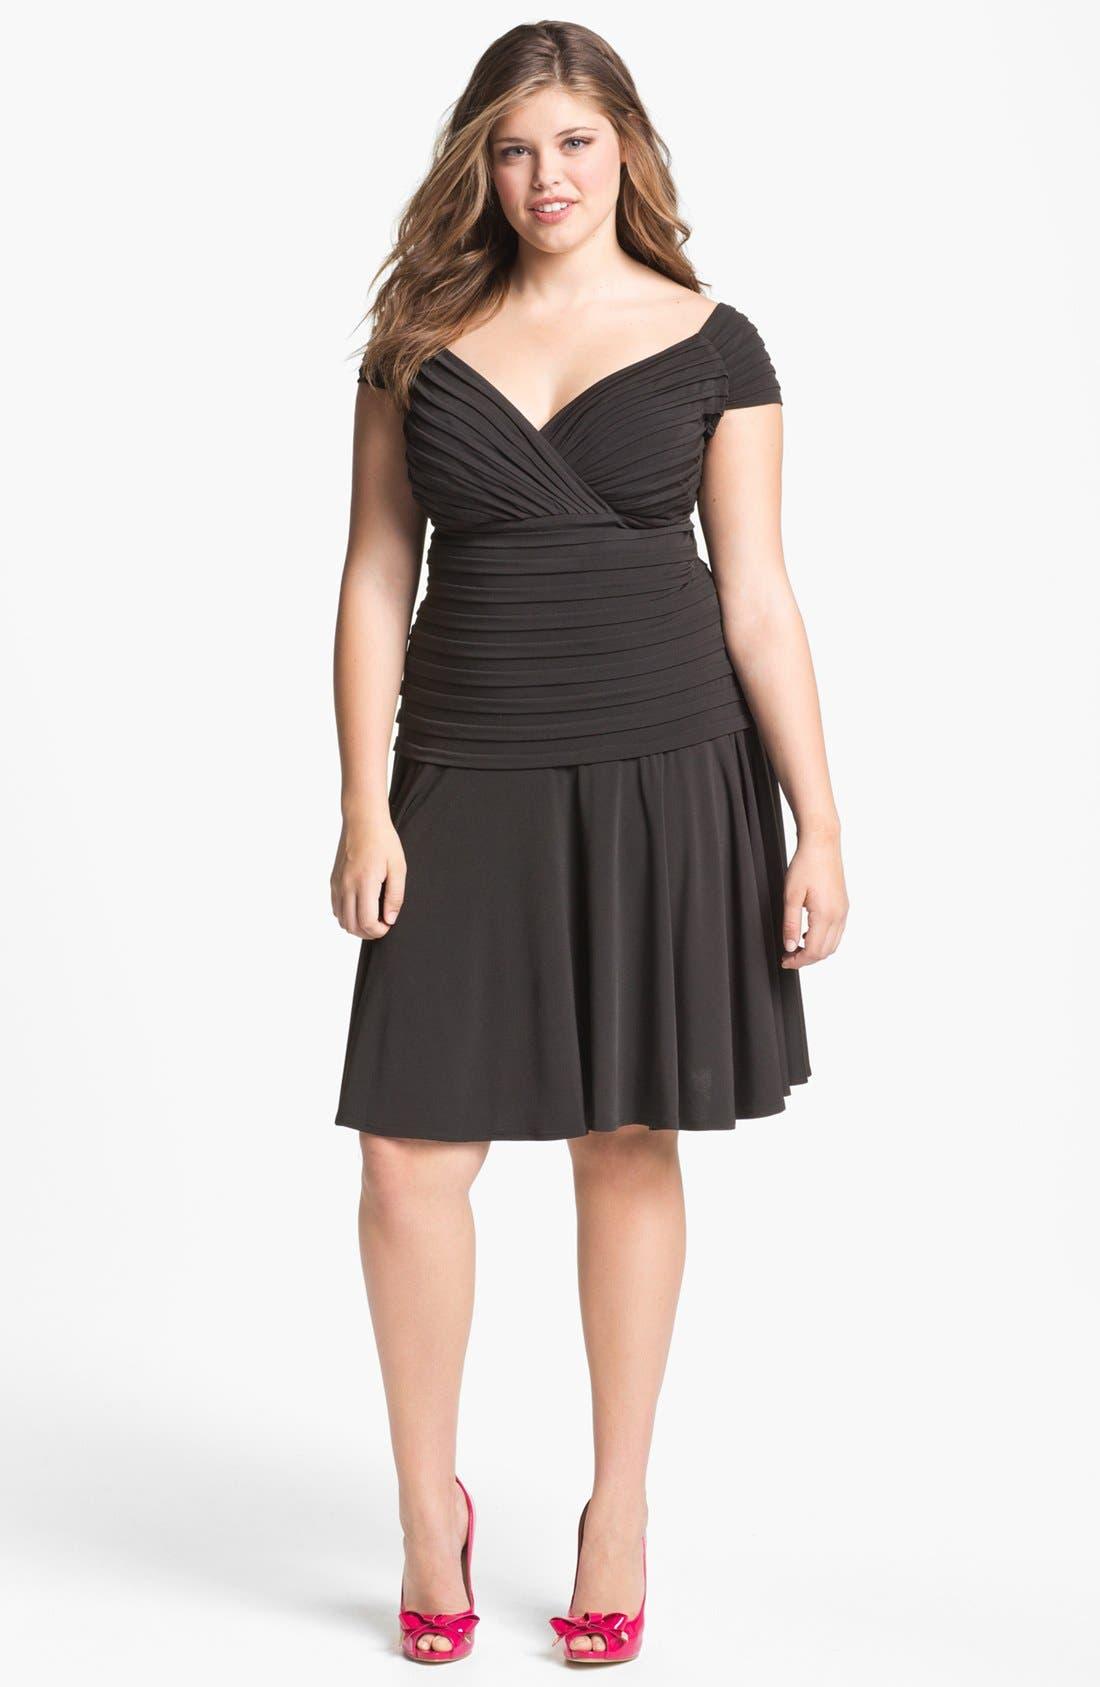 Alternate Image 1 Selected - London Times Drop Waist Jersey Dress (Plus)